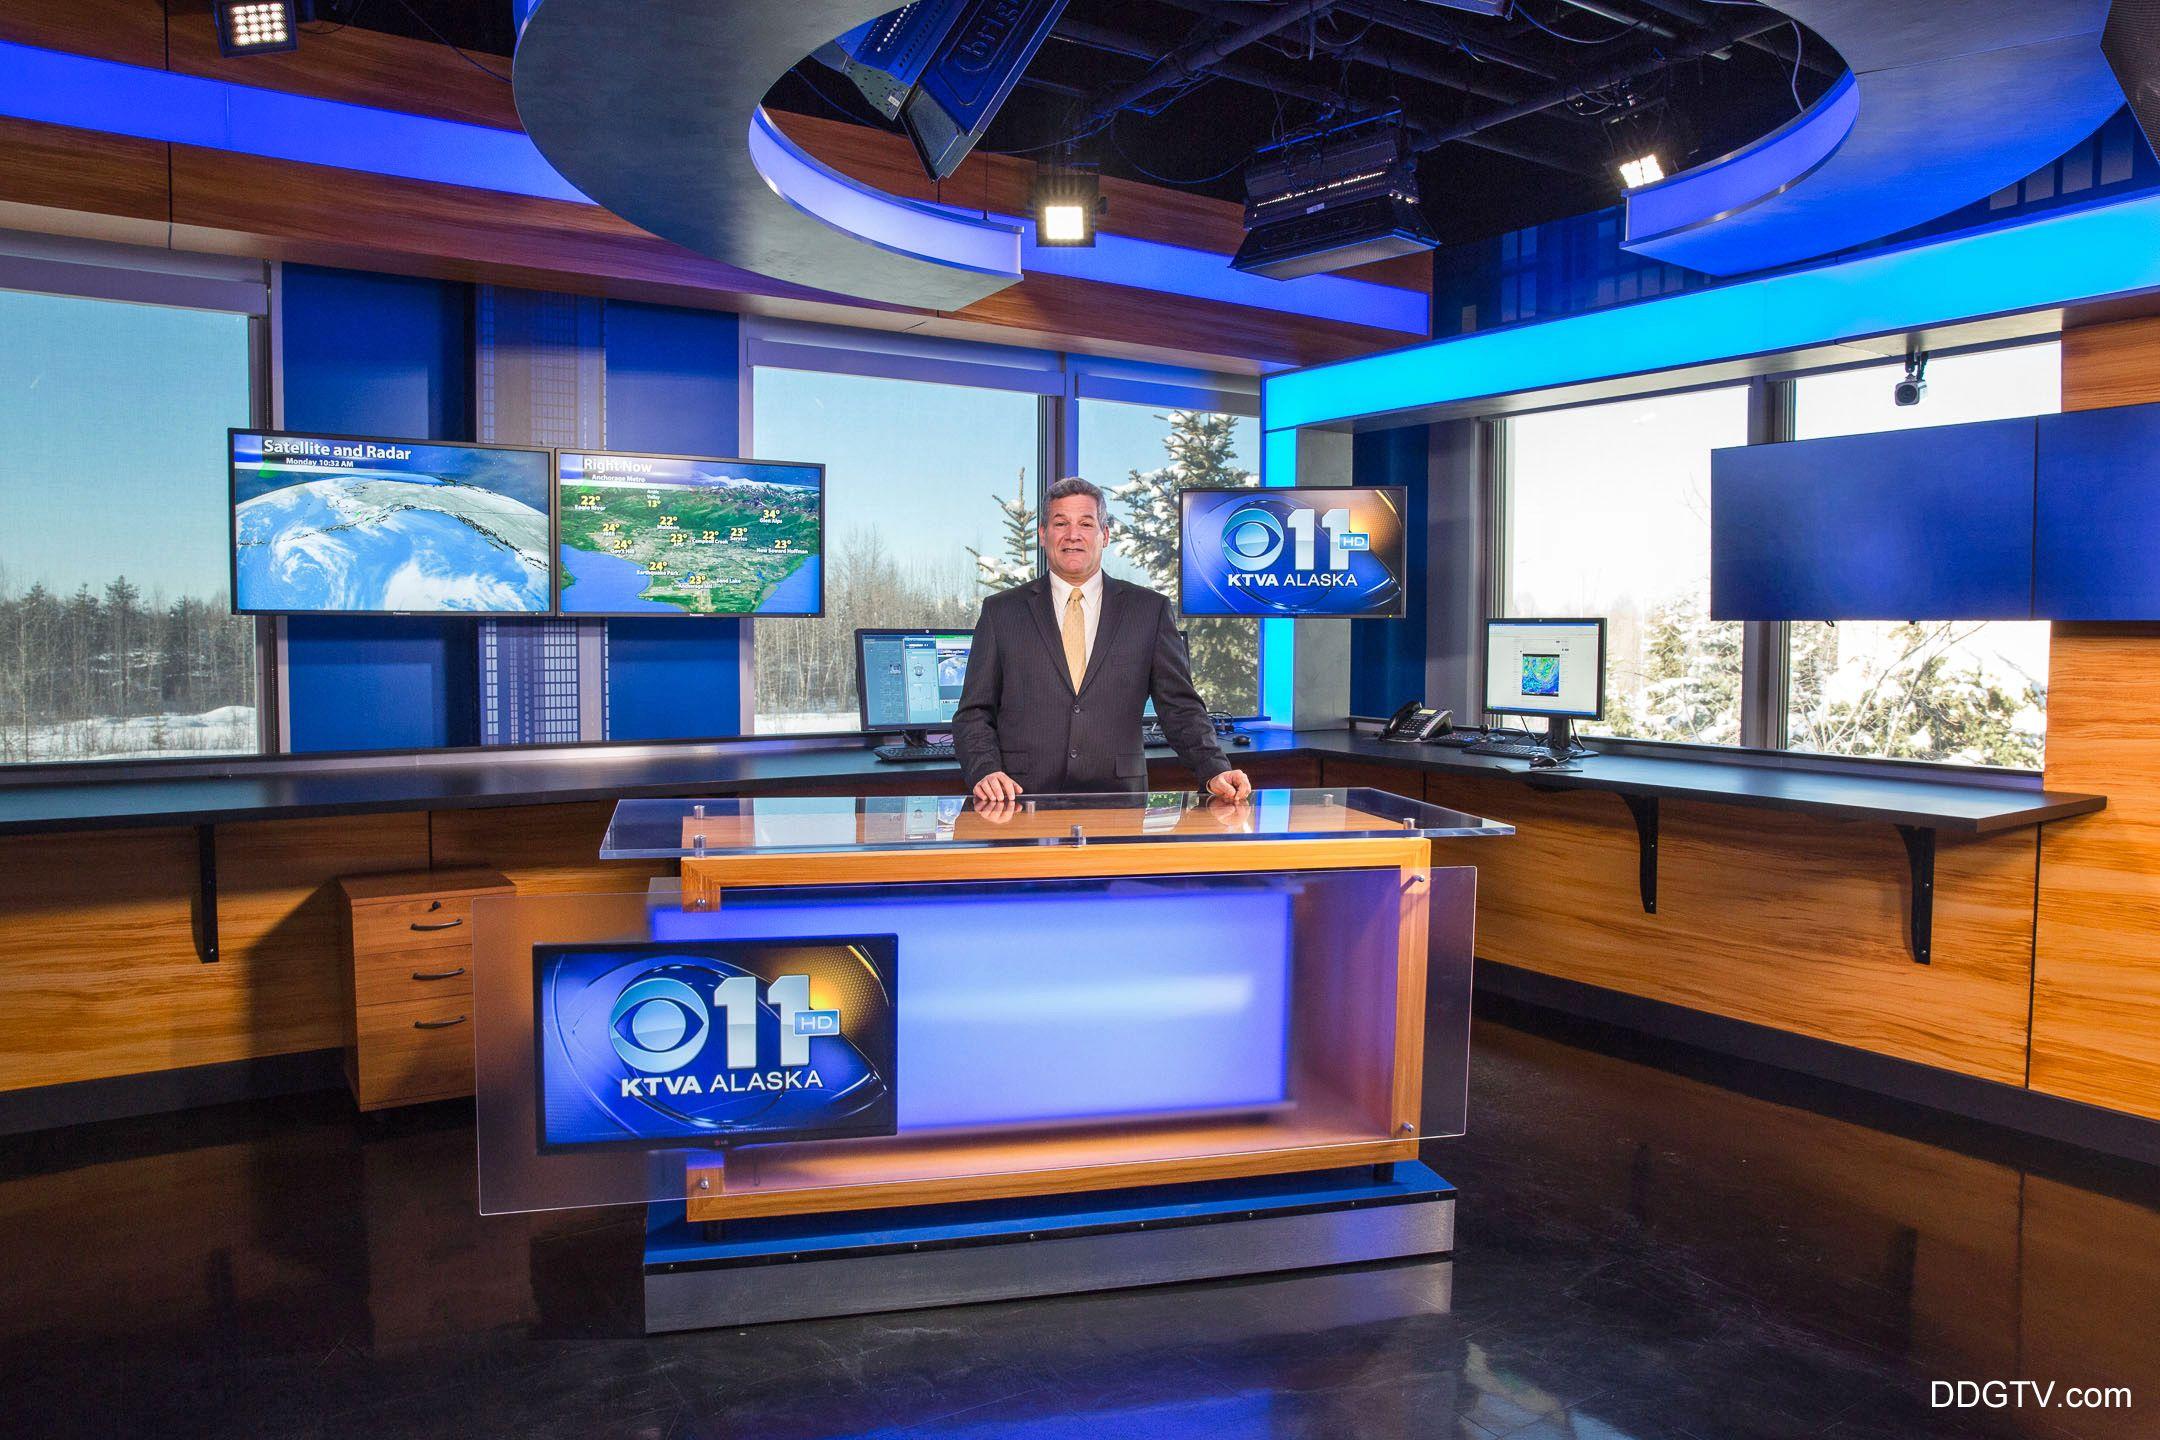 ORF 2 Newsroom - Veech x Veech